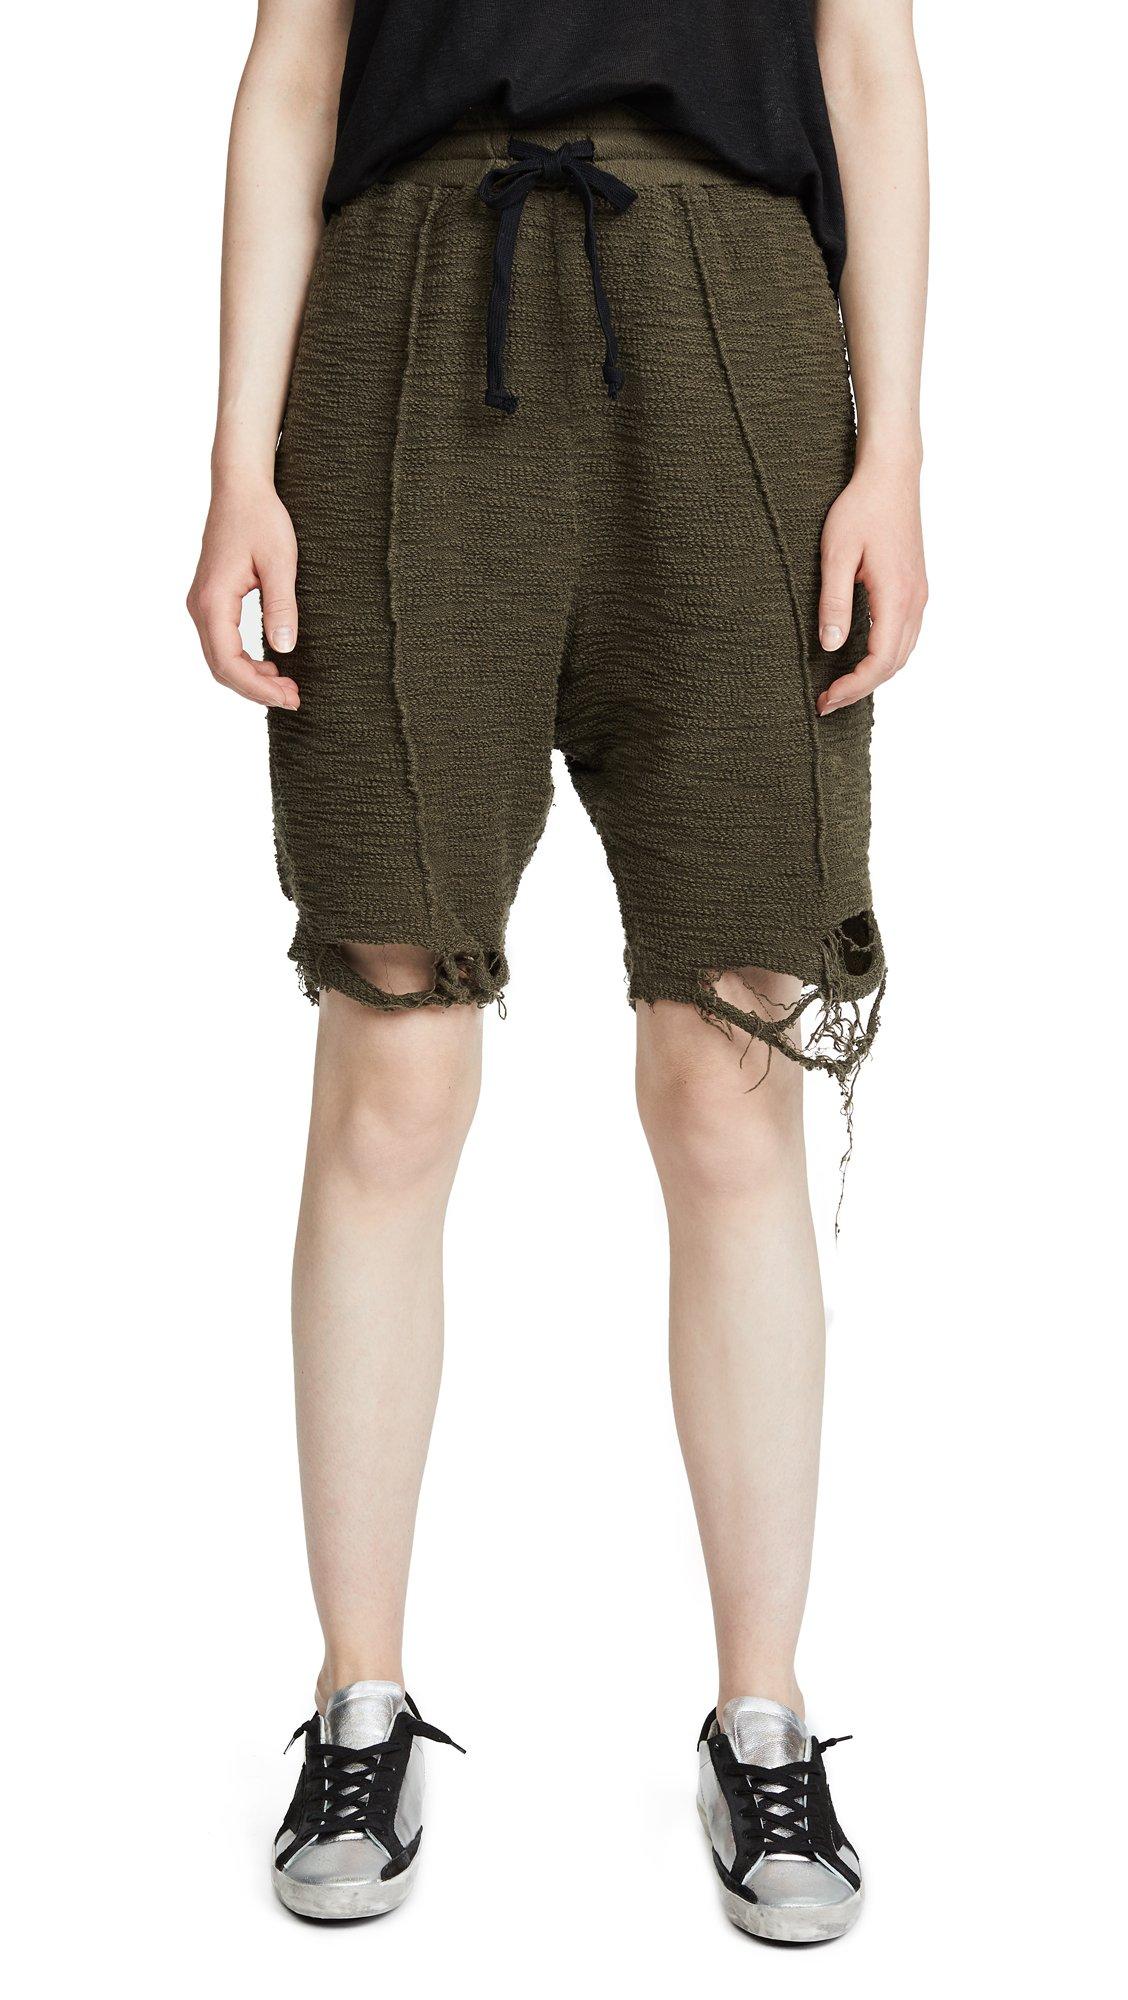 Twenty Tees Women's Destroyed Hem Sweat Shorts, Army, Medium